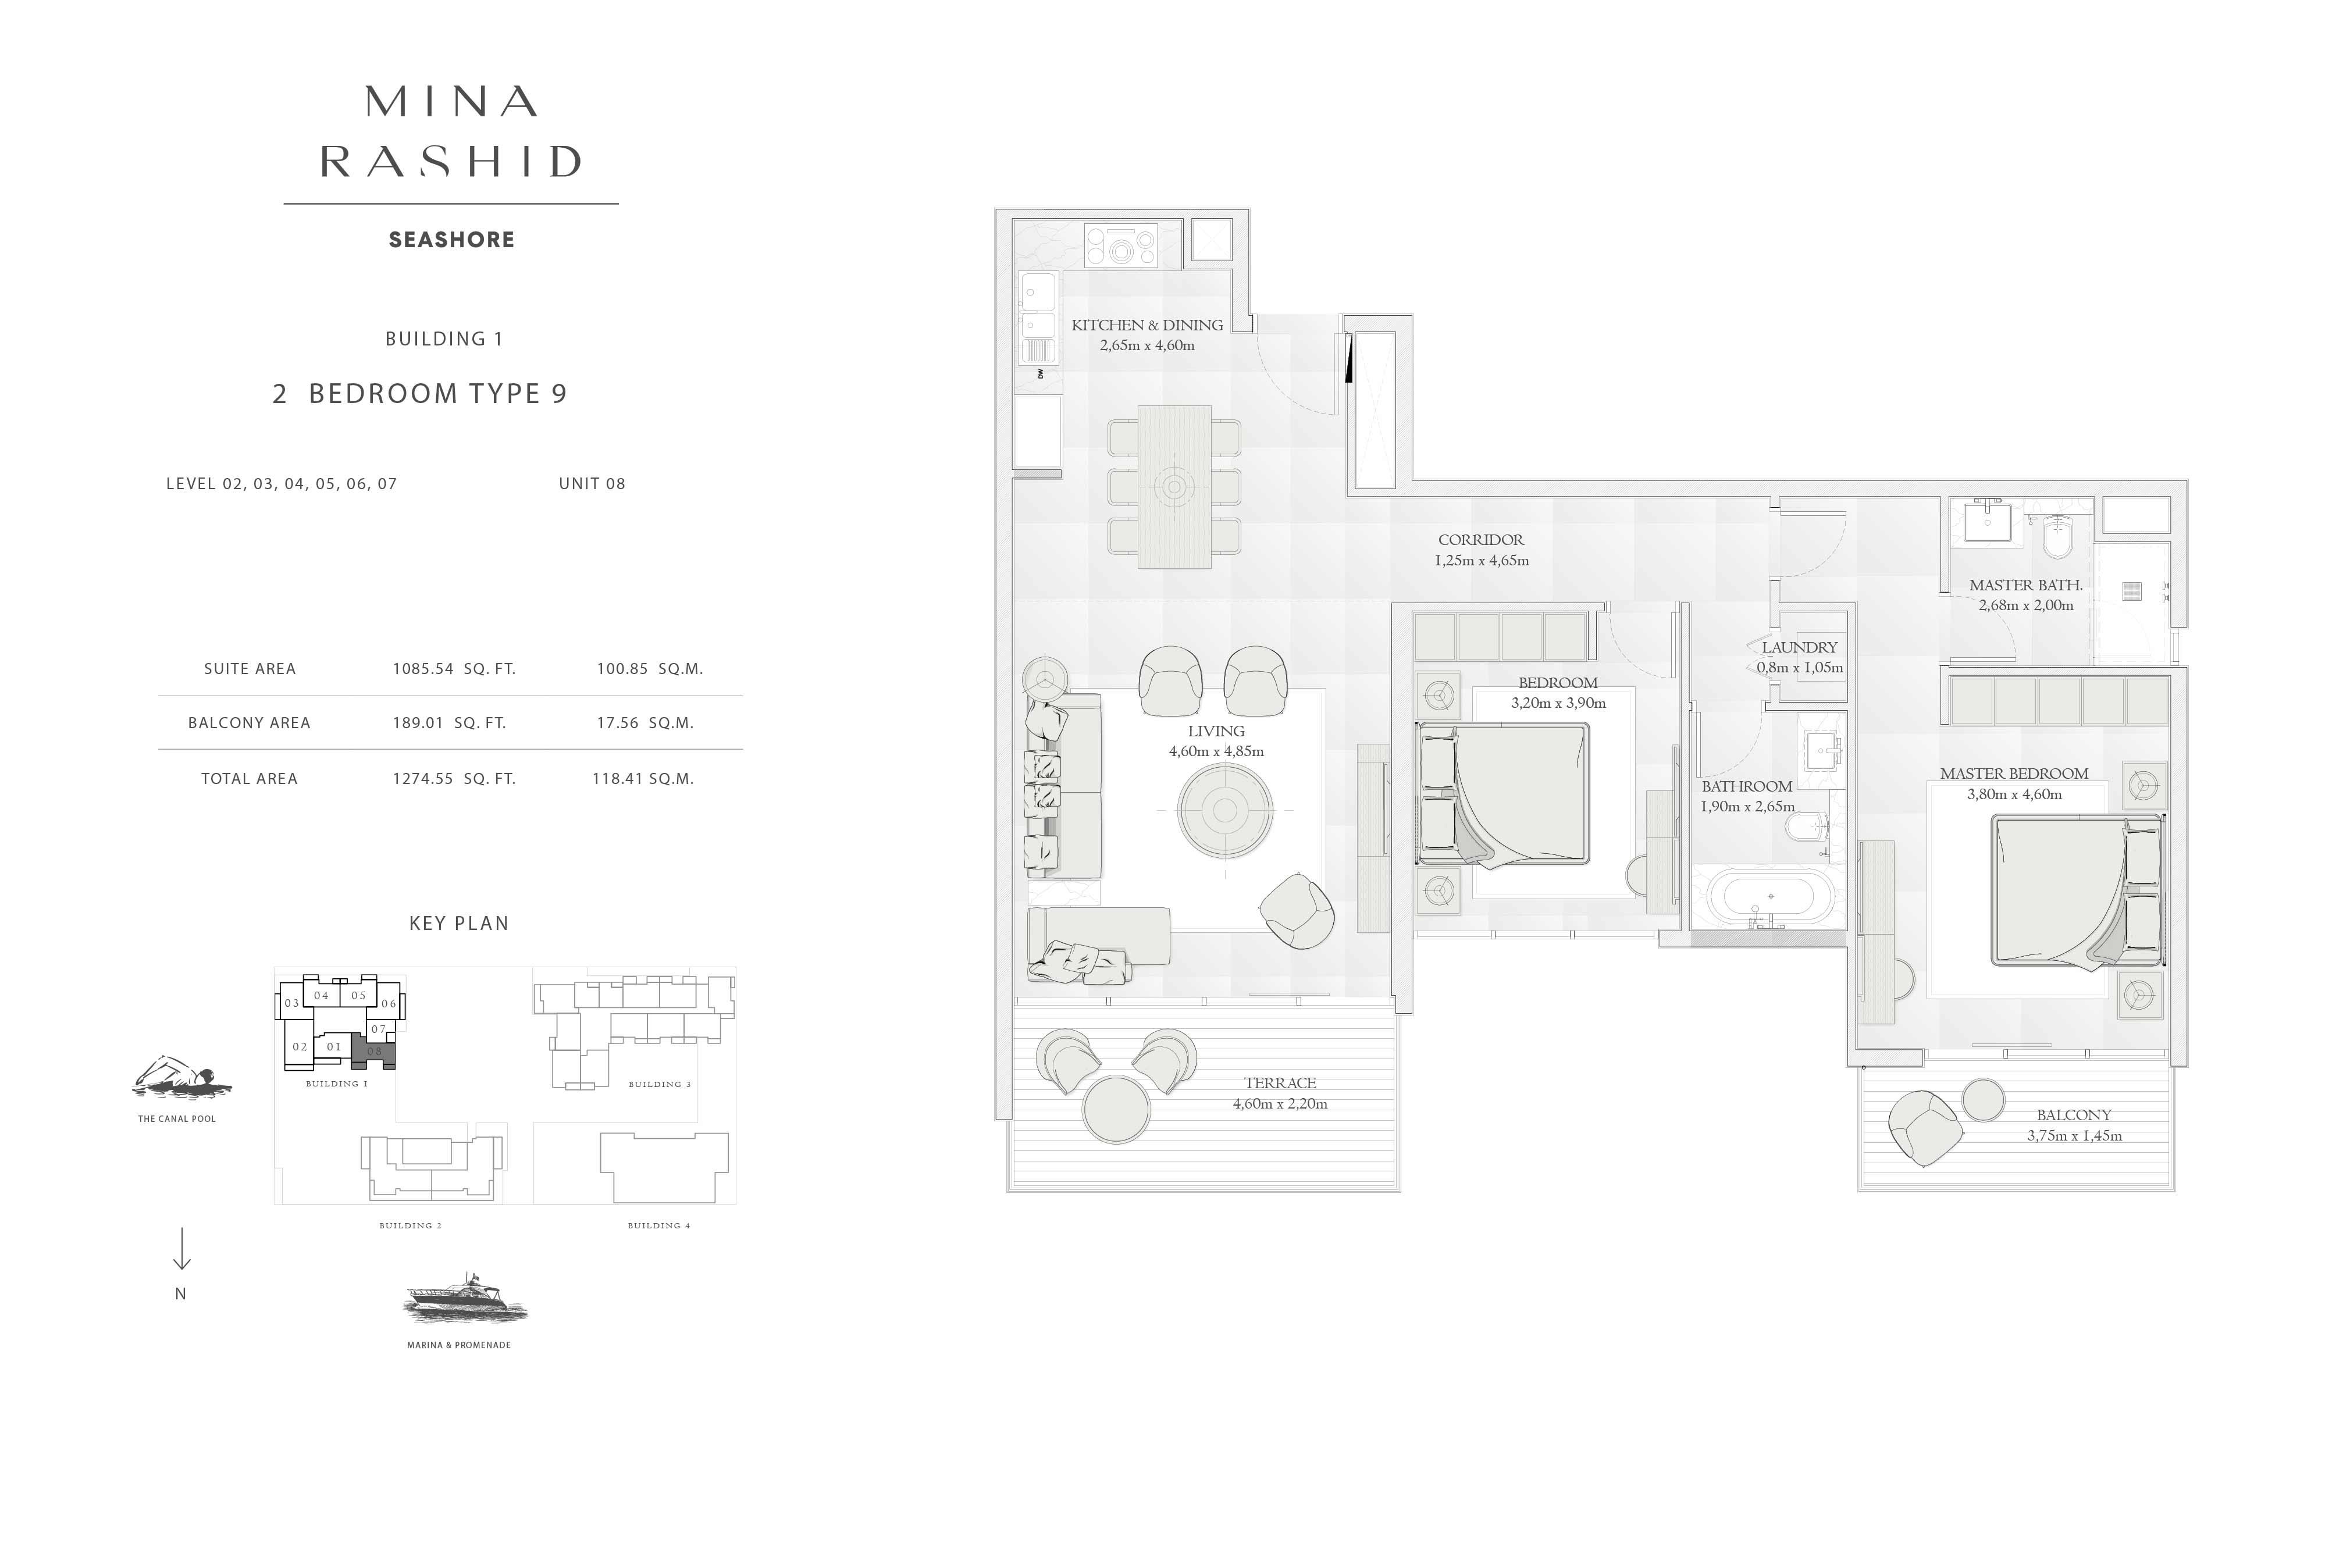 Building-1, 2-Bedroom Type-9, Size-1274-Sq Ft